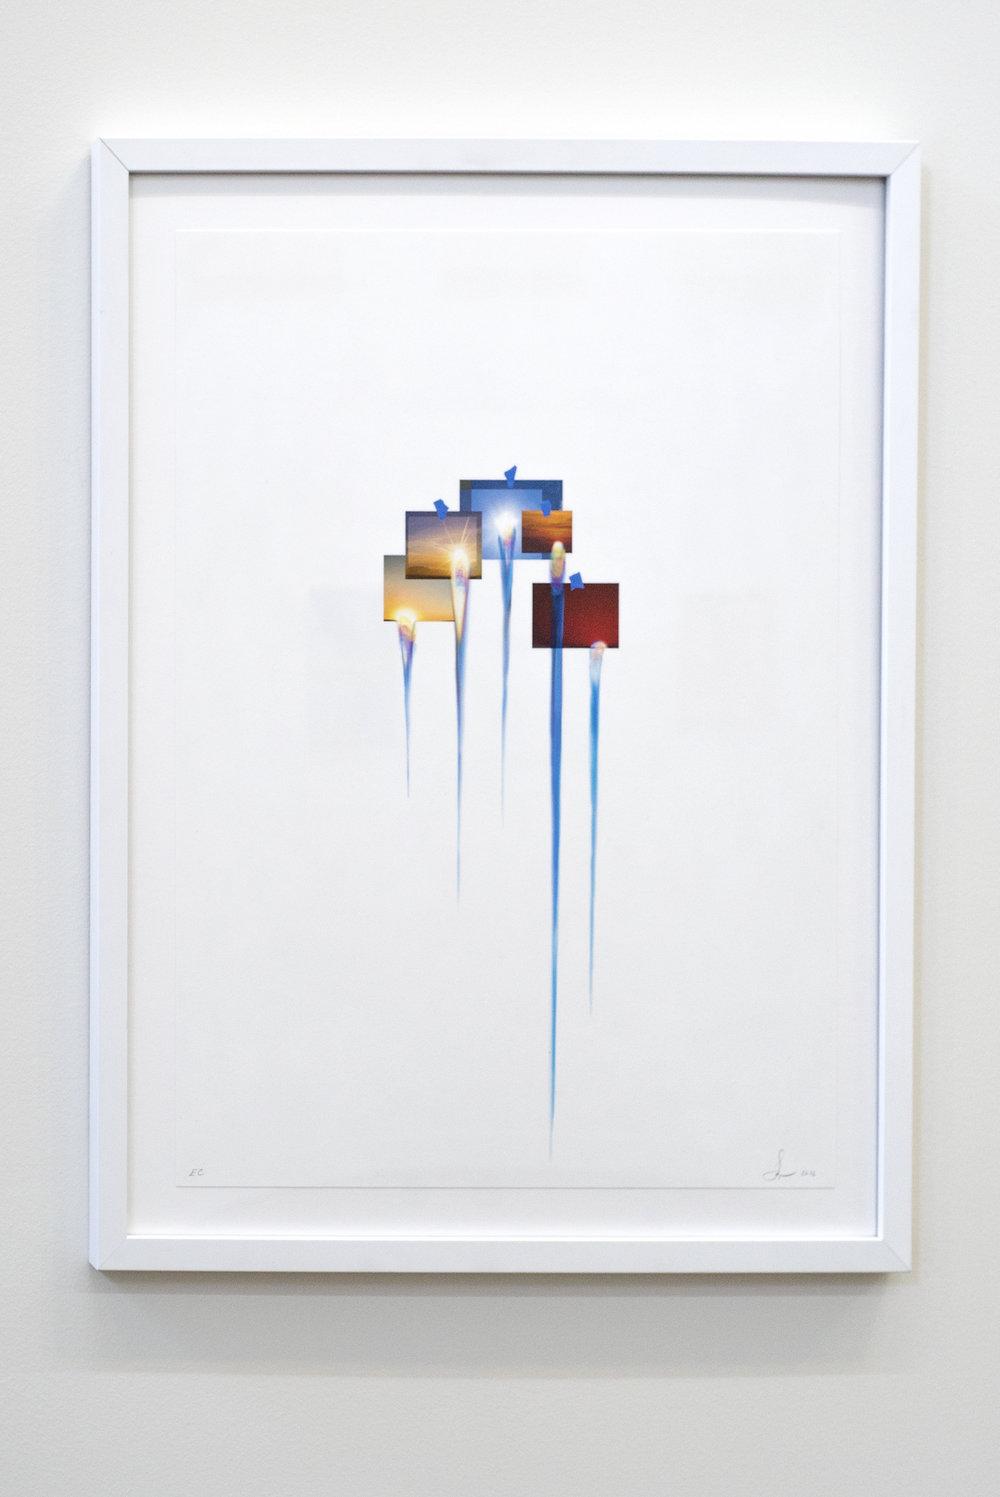 'Images in Debris' Sarah Sze, 2016.